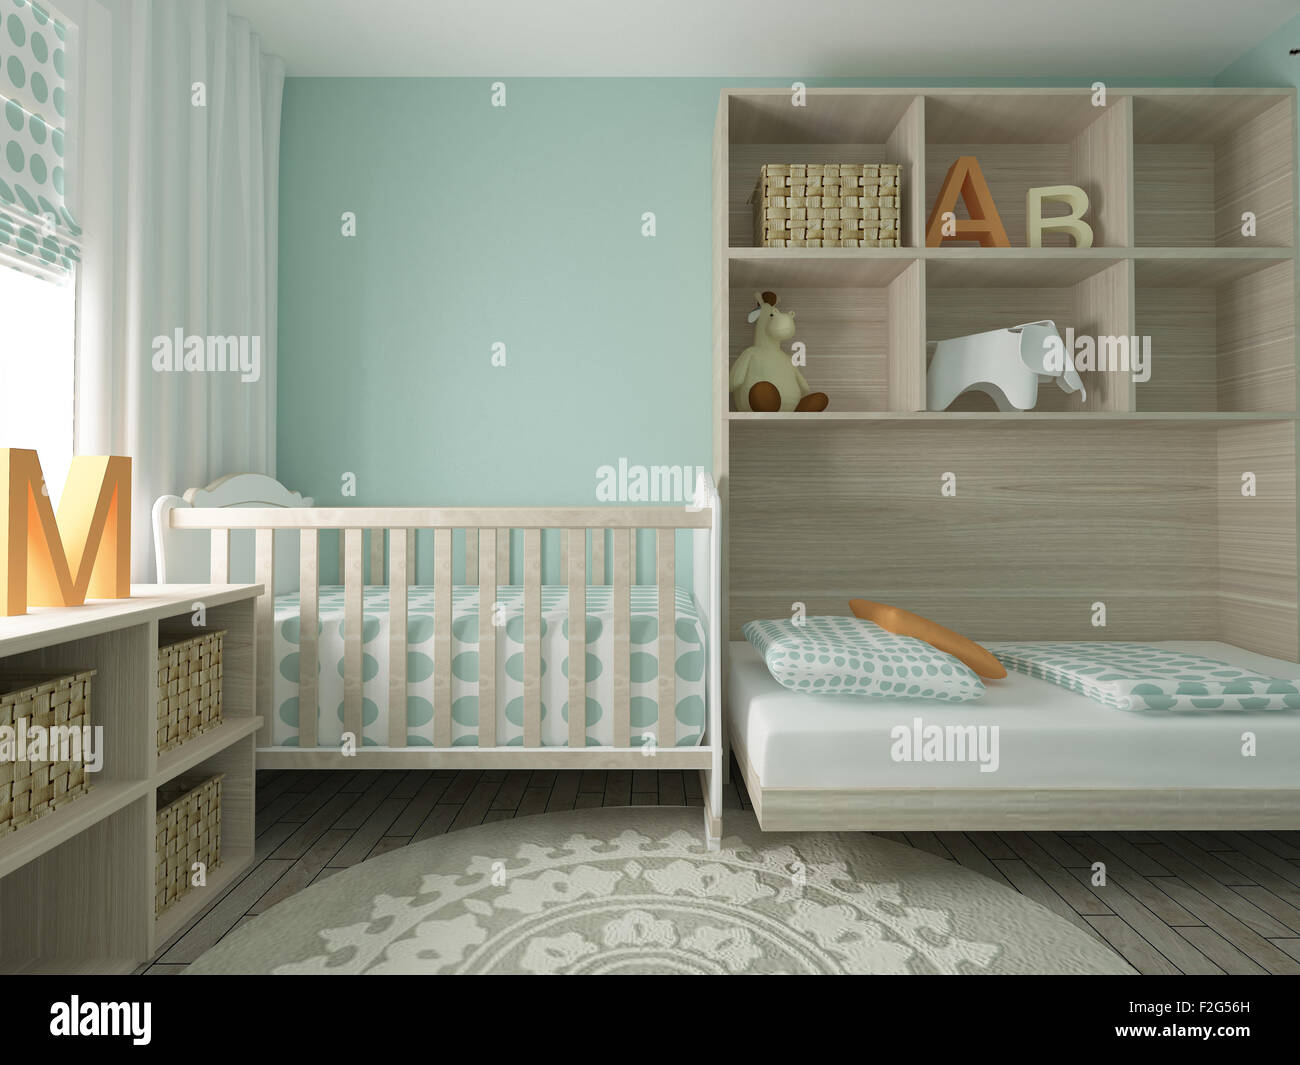 Baby Room, Nursery, Childrenu0027s Room, Playroom, Interior Design, 3d Render